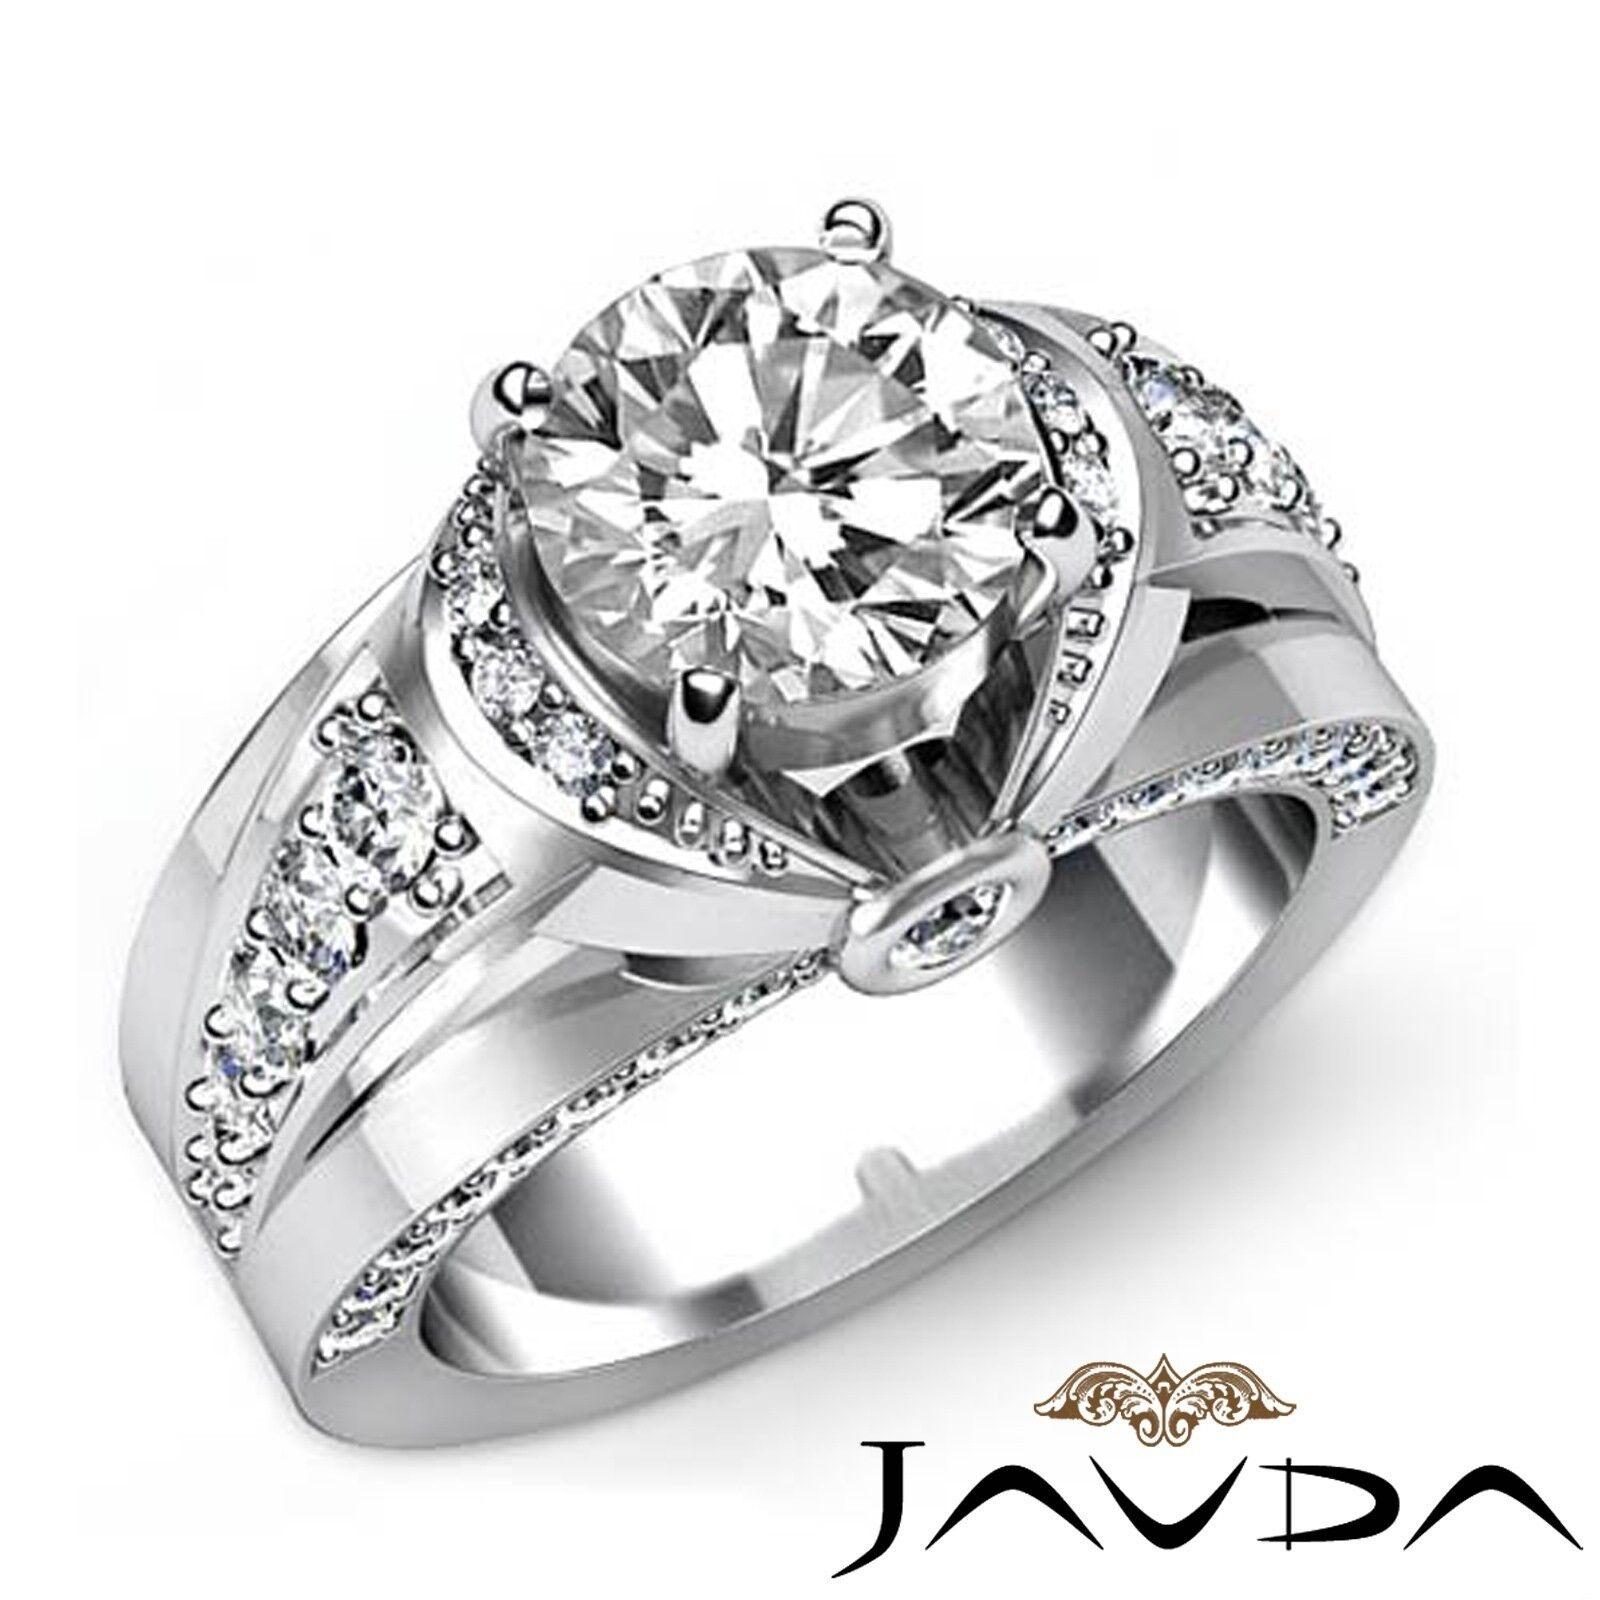 2.54ct Knot Classic Sidestone Round Diamond Engagement Ring GIA H-VS2 White Gold